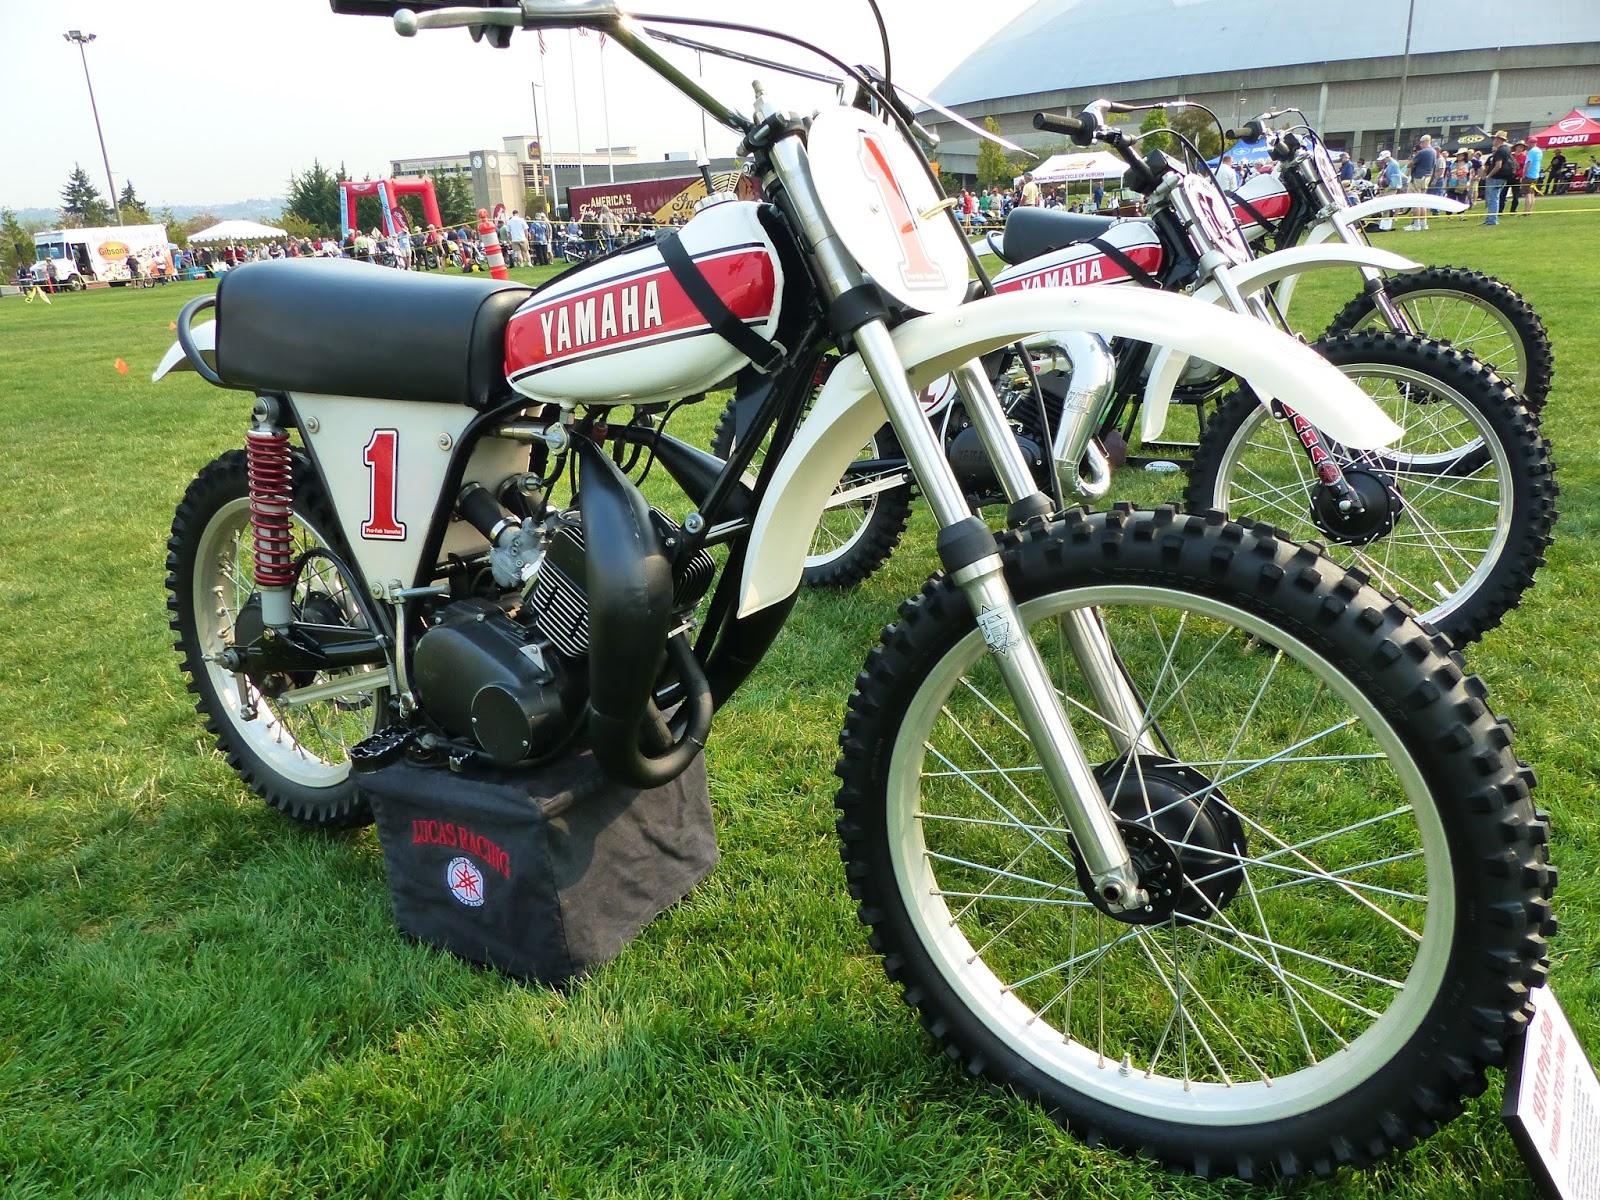 Yamaha Motorcycle Tacoma